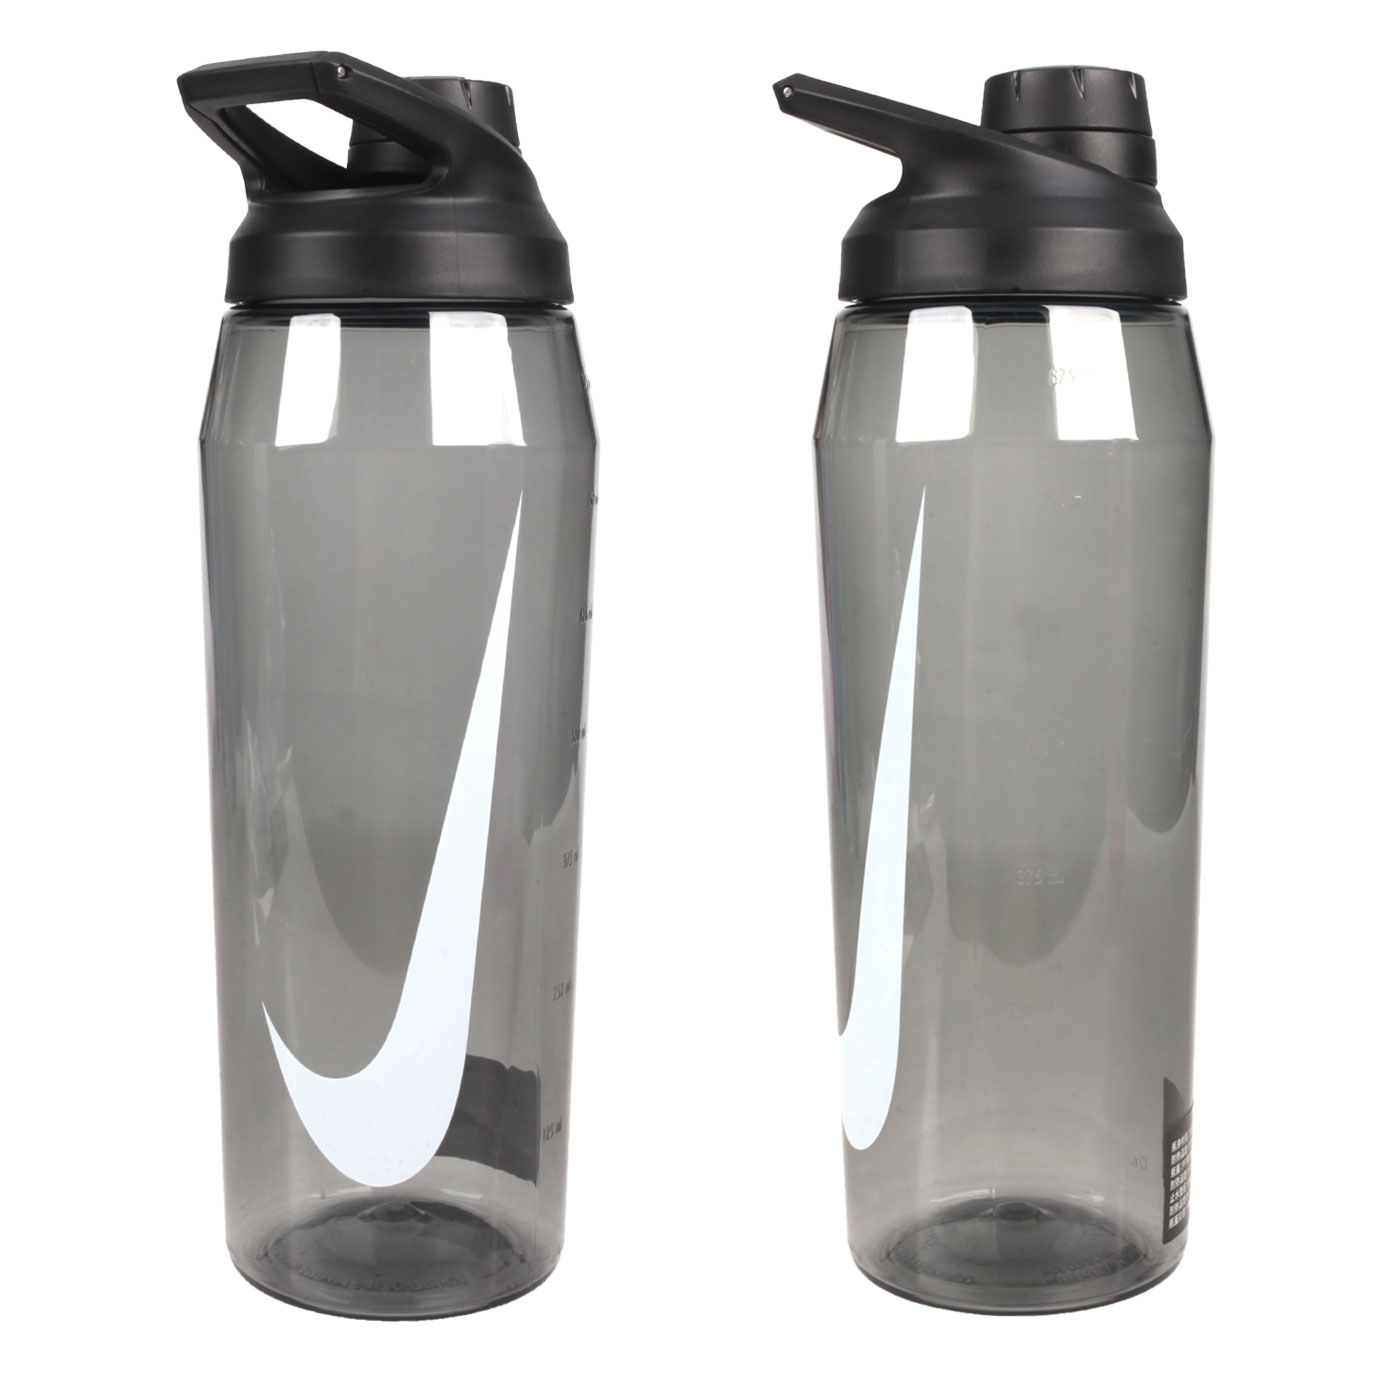 NIKE 32OZ 大口徑水壺 N100062302532 - 黑白